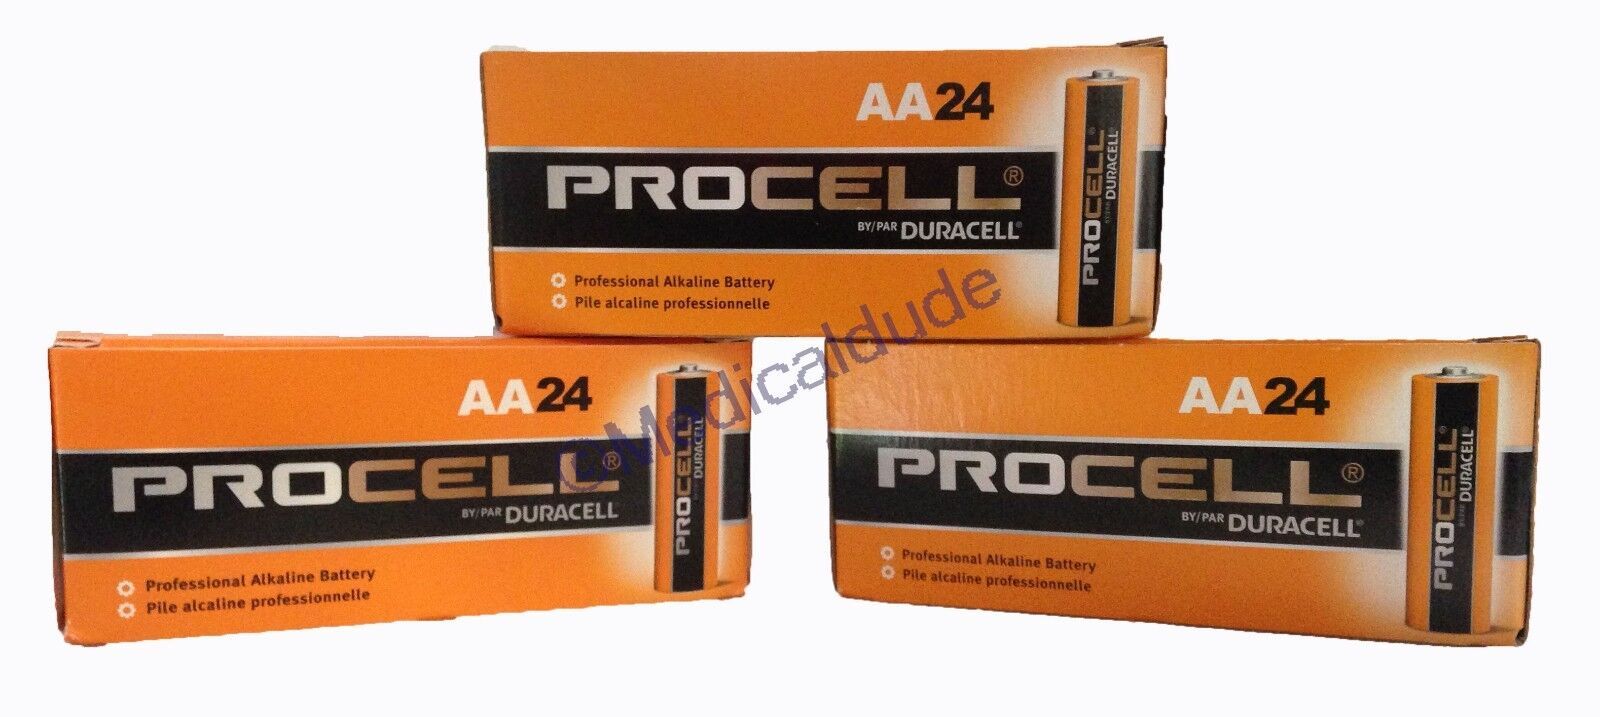 Duracell Procell PC1500 Alkaline AA Batteries 72 Batteries 3